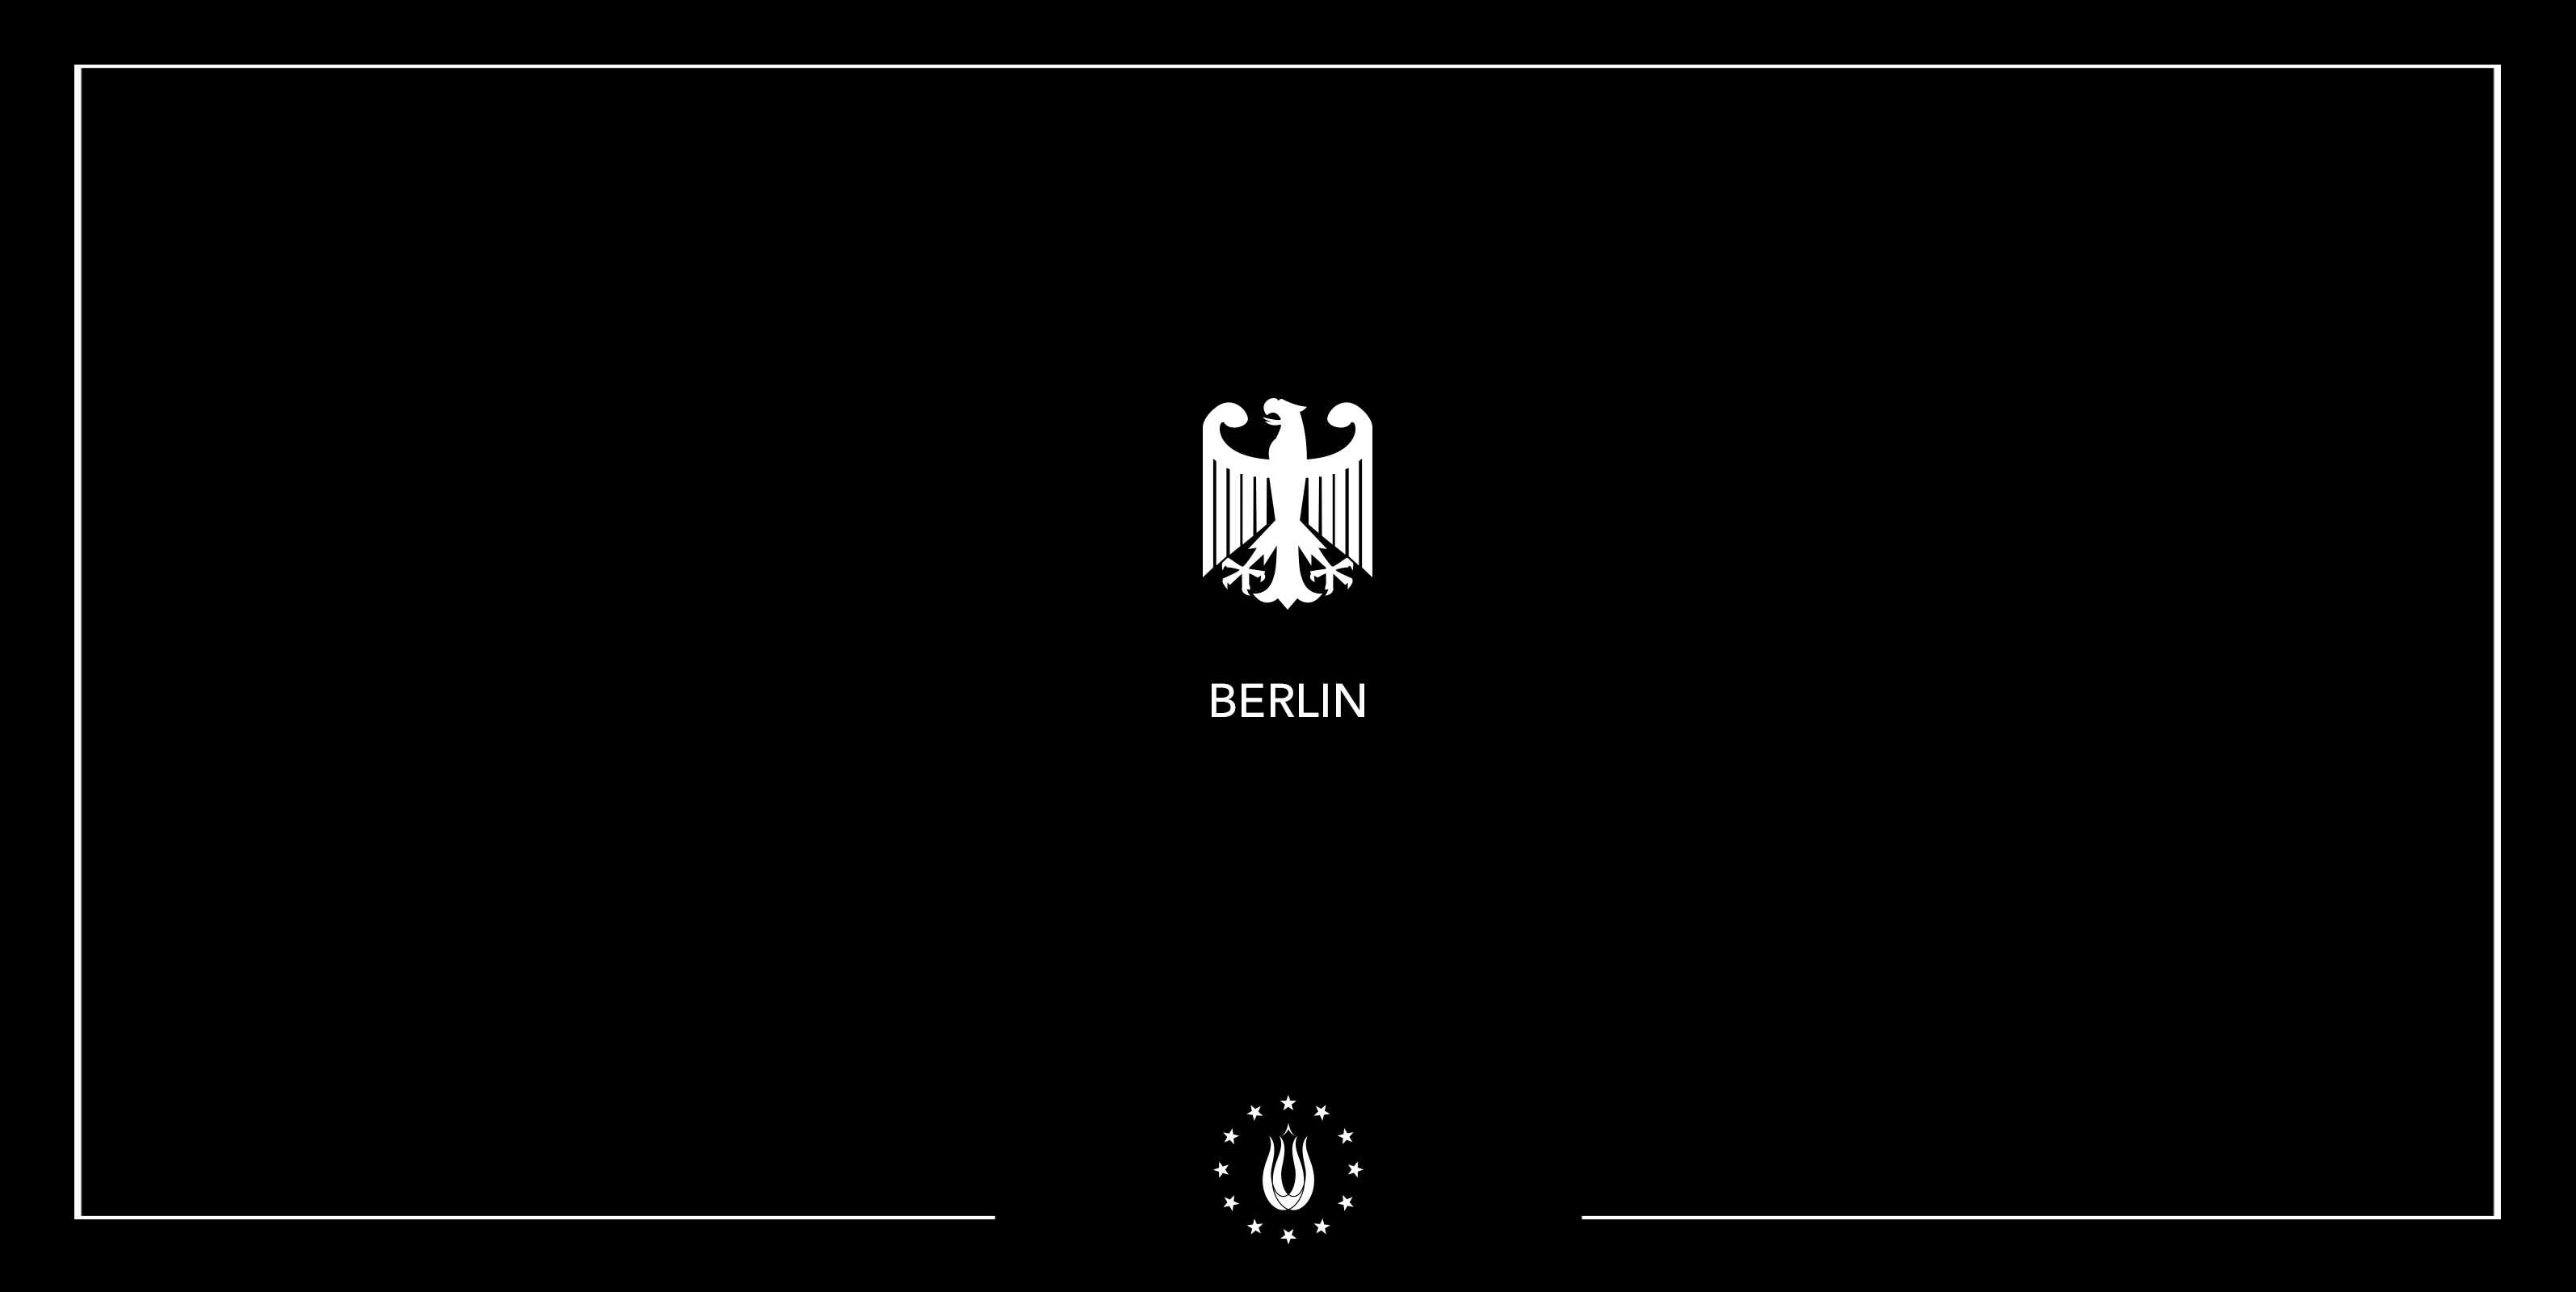 uetd_web_anschlag_berlin